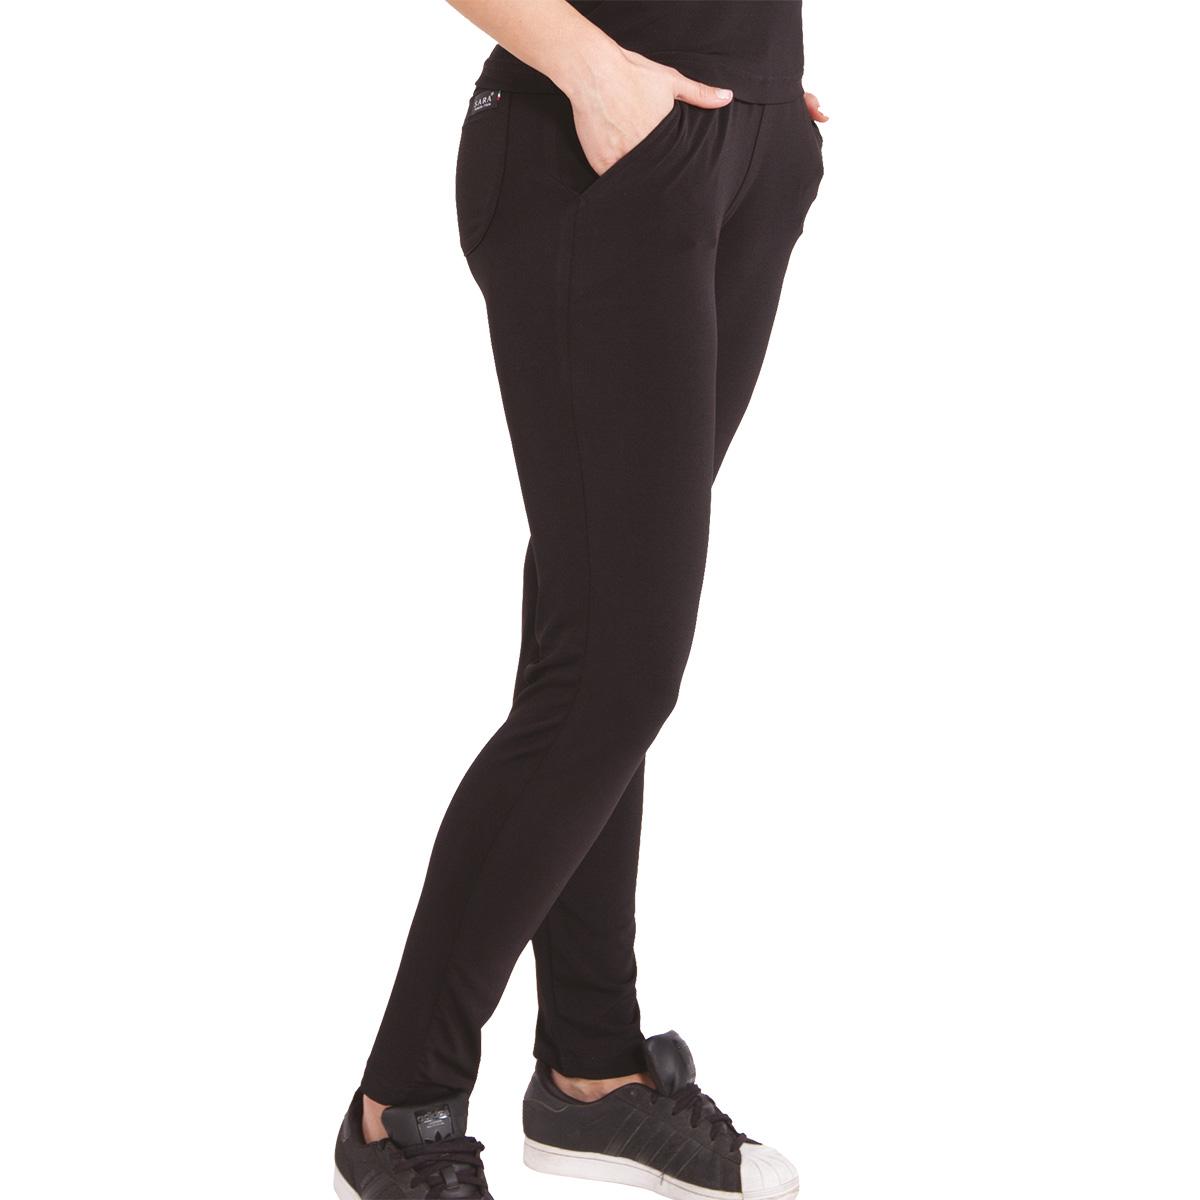 riply-pantalone-comodo-donna